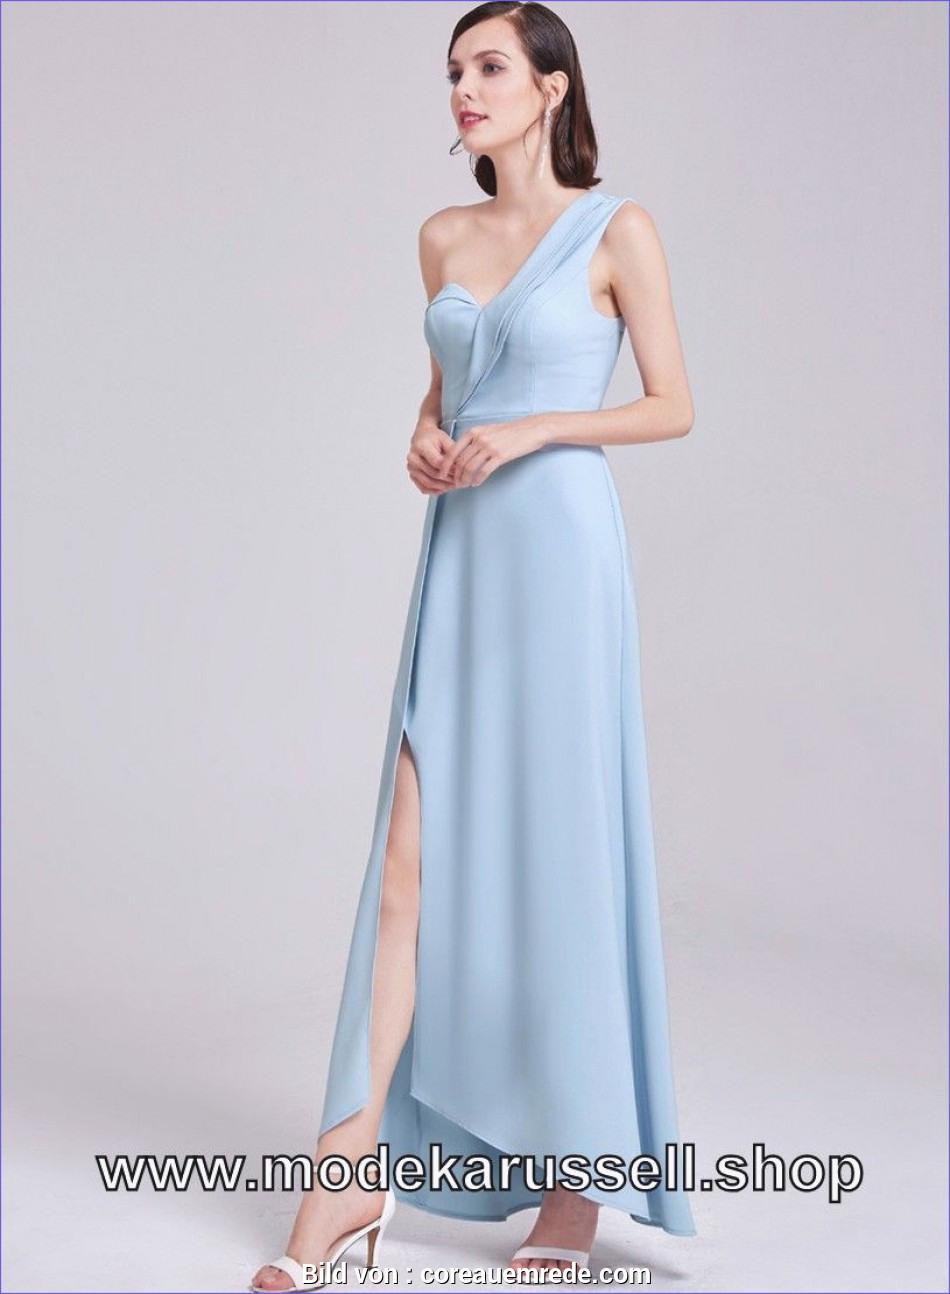 13 Kreativ Abendkleider Oldenburg Vertrieb Luxurius Abendkleider Oldenburg Stylish